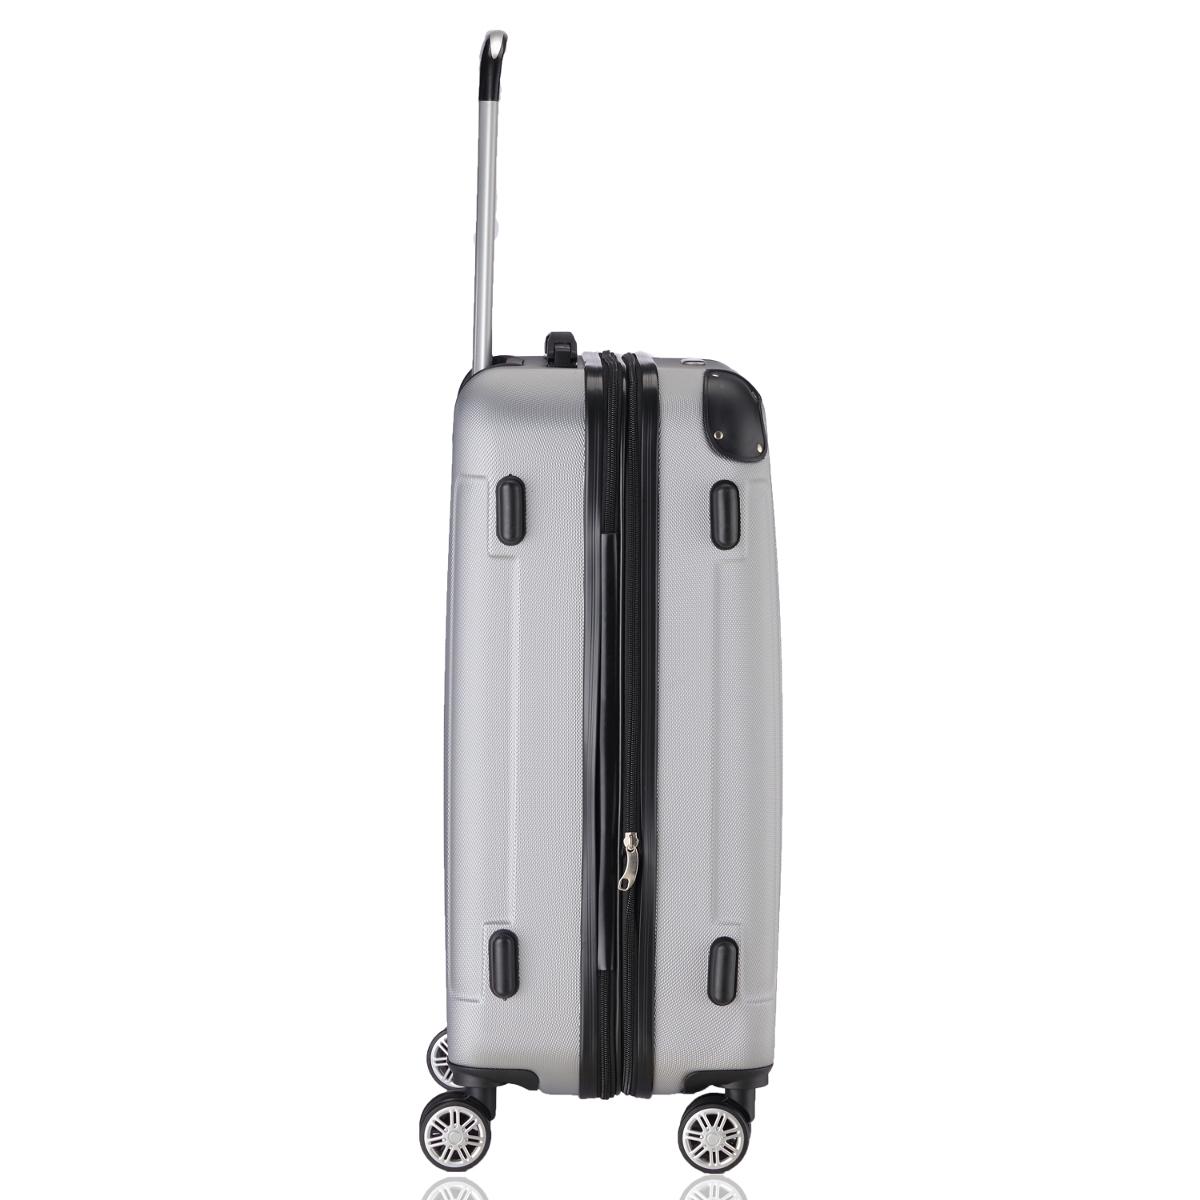 Koffer-Flexot-2045-Hartschalenkoffer-Trolley-Kofferset-Reisekoffer-M-L-XL-Set Indexbild 71